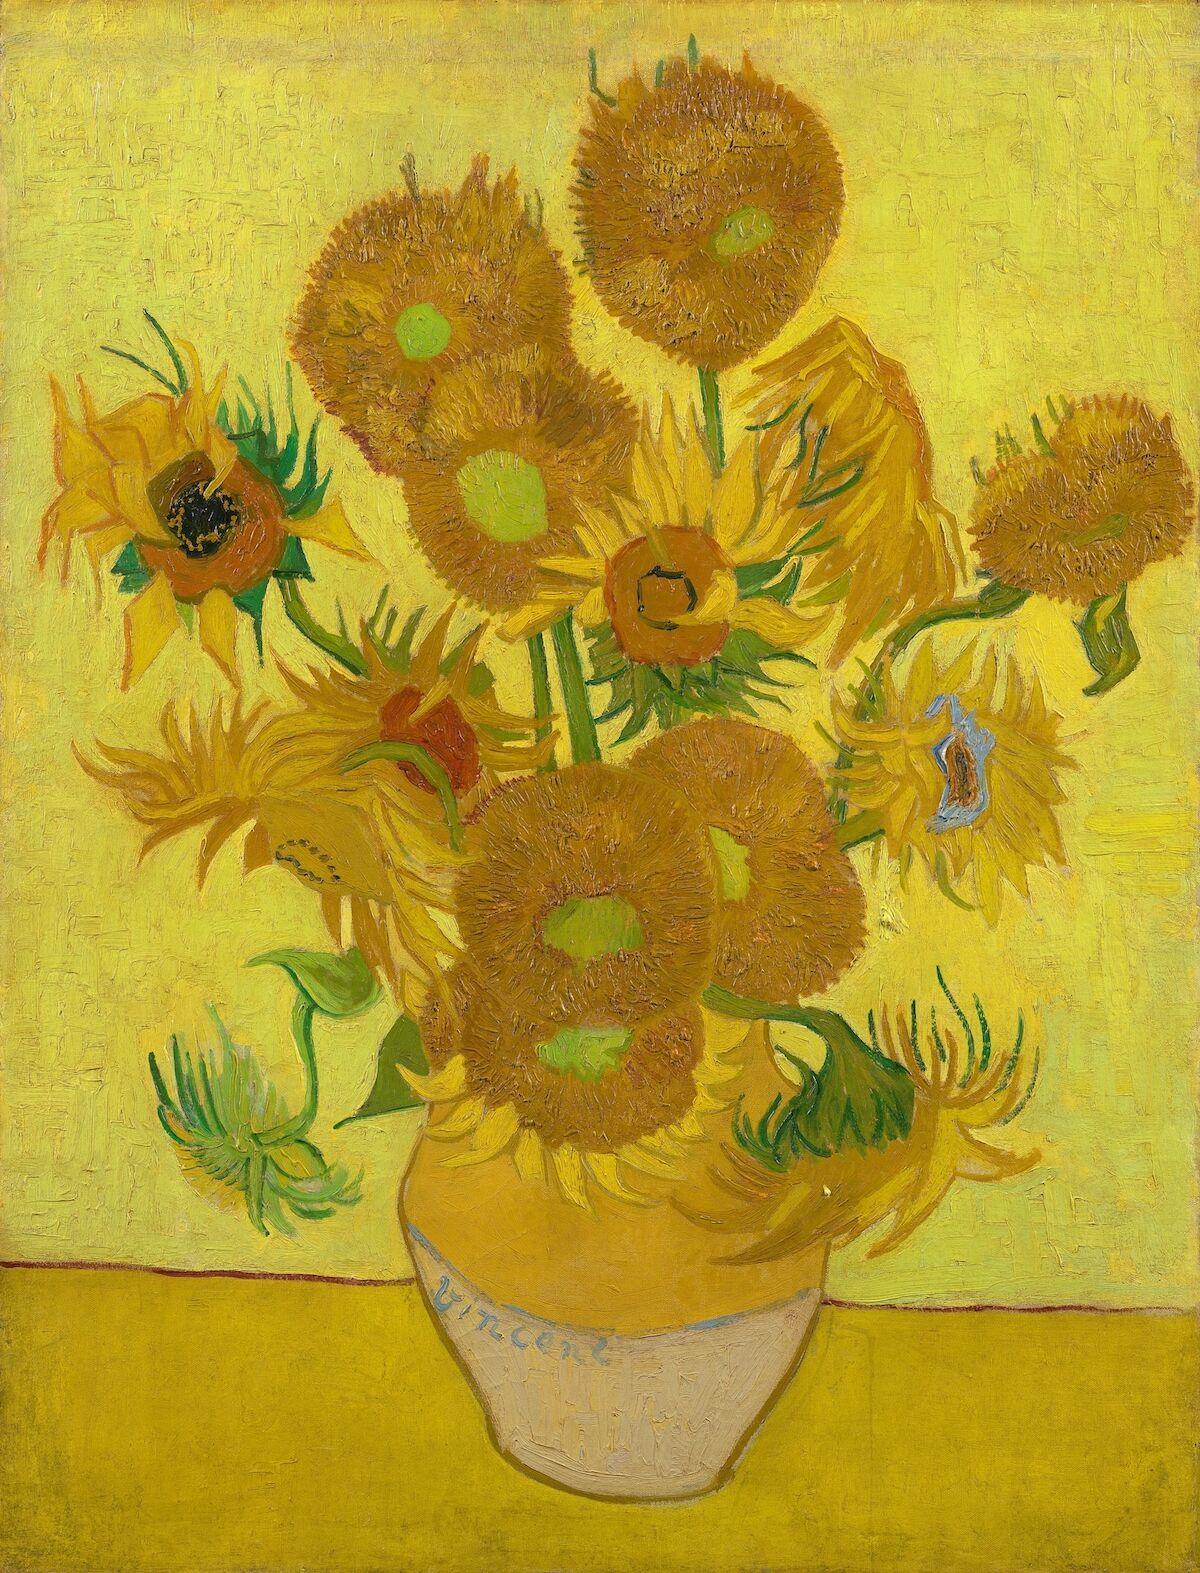 Vincent van Gogh, Sunflowers, 1889. Courtesy Van Gogh Museum, Amsterdam, via Wikimedia Commons.